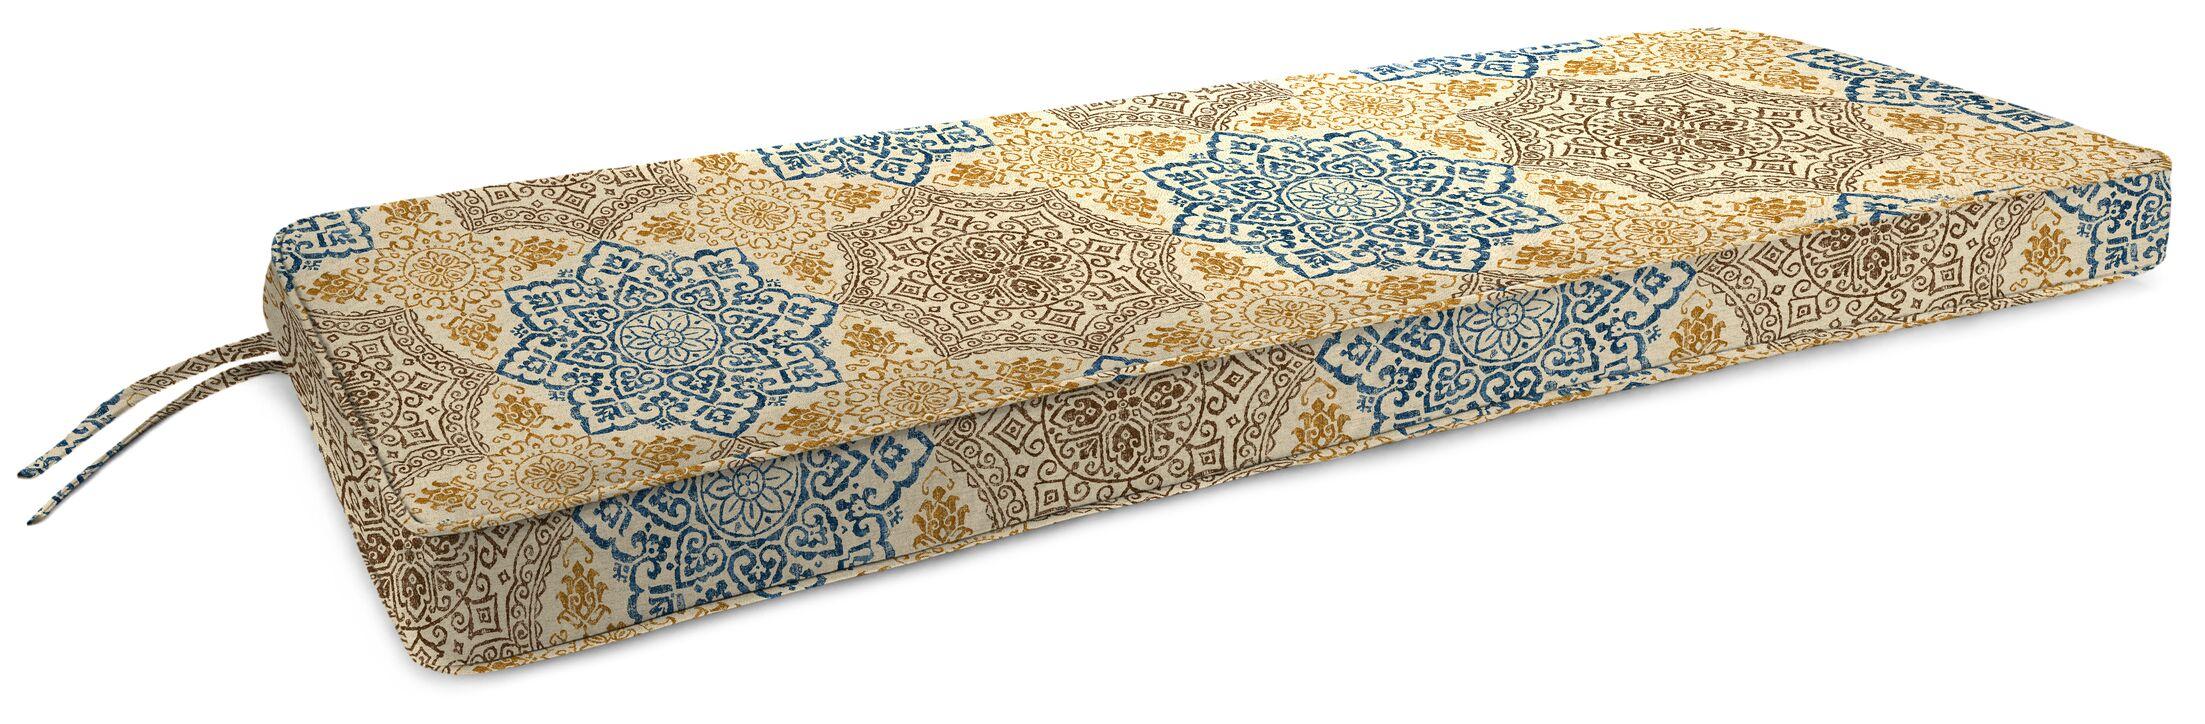 Indoor Bench Cushion Fabric: Foley Topaz